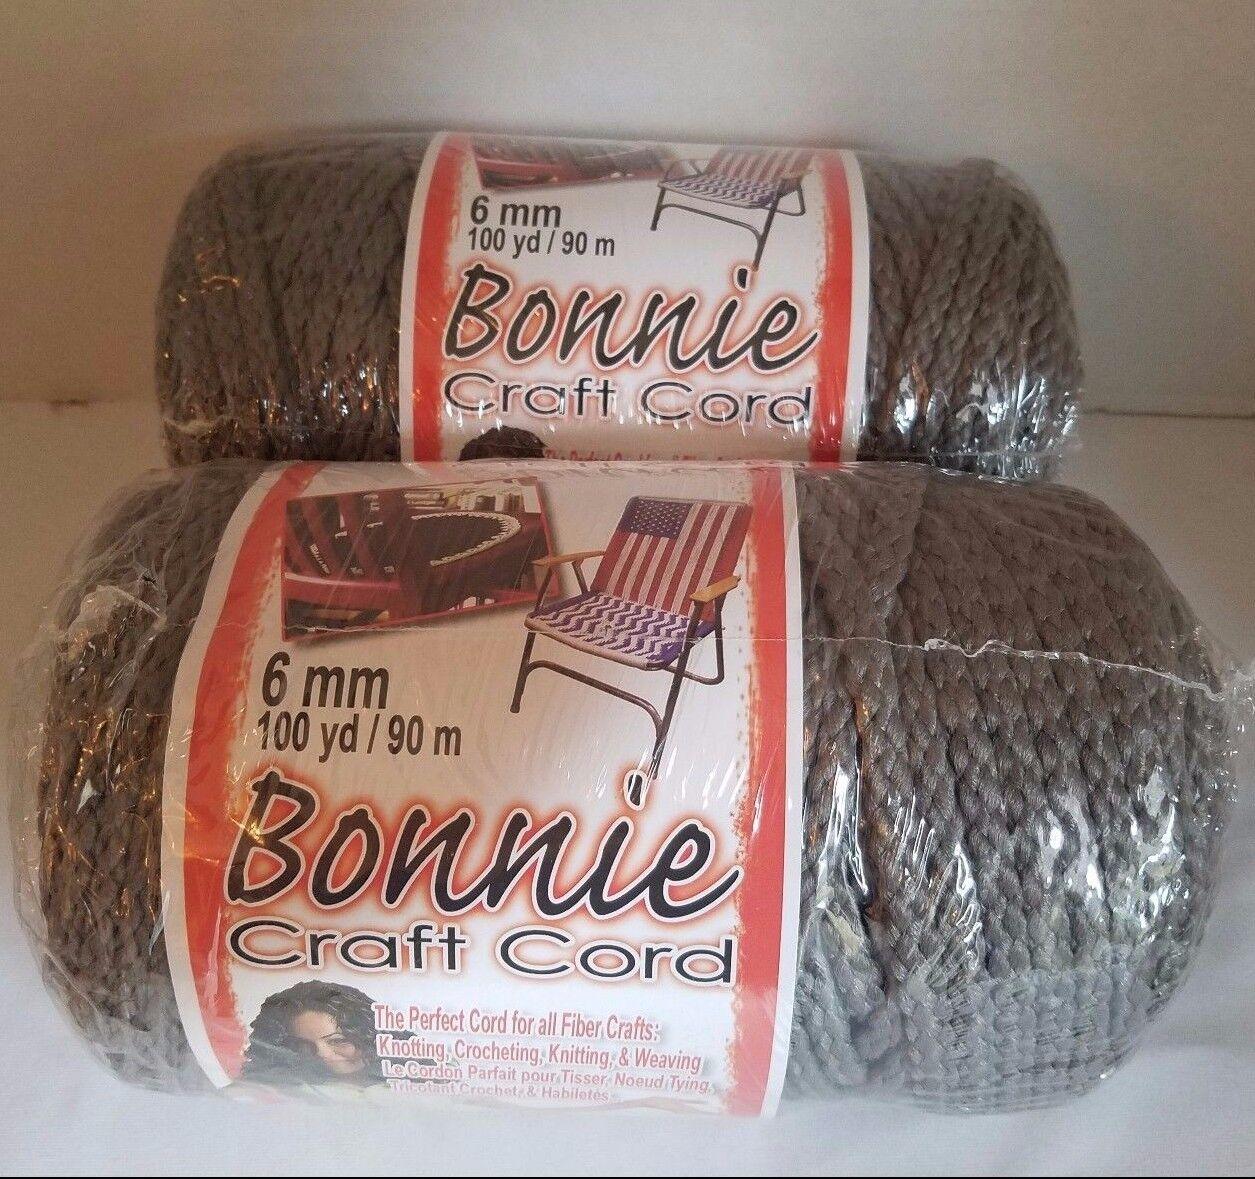 Bonnie craft cord 6mm - Lot Of 2 Rolls Smoke Gray 6mm Bonnie